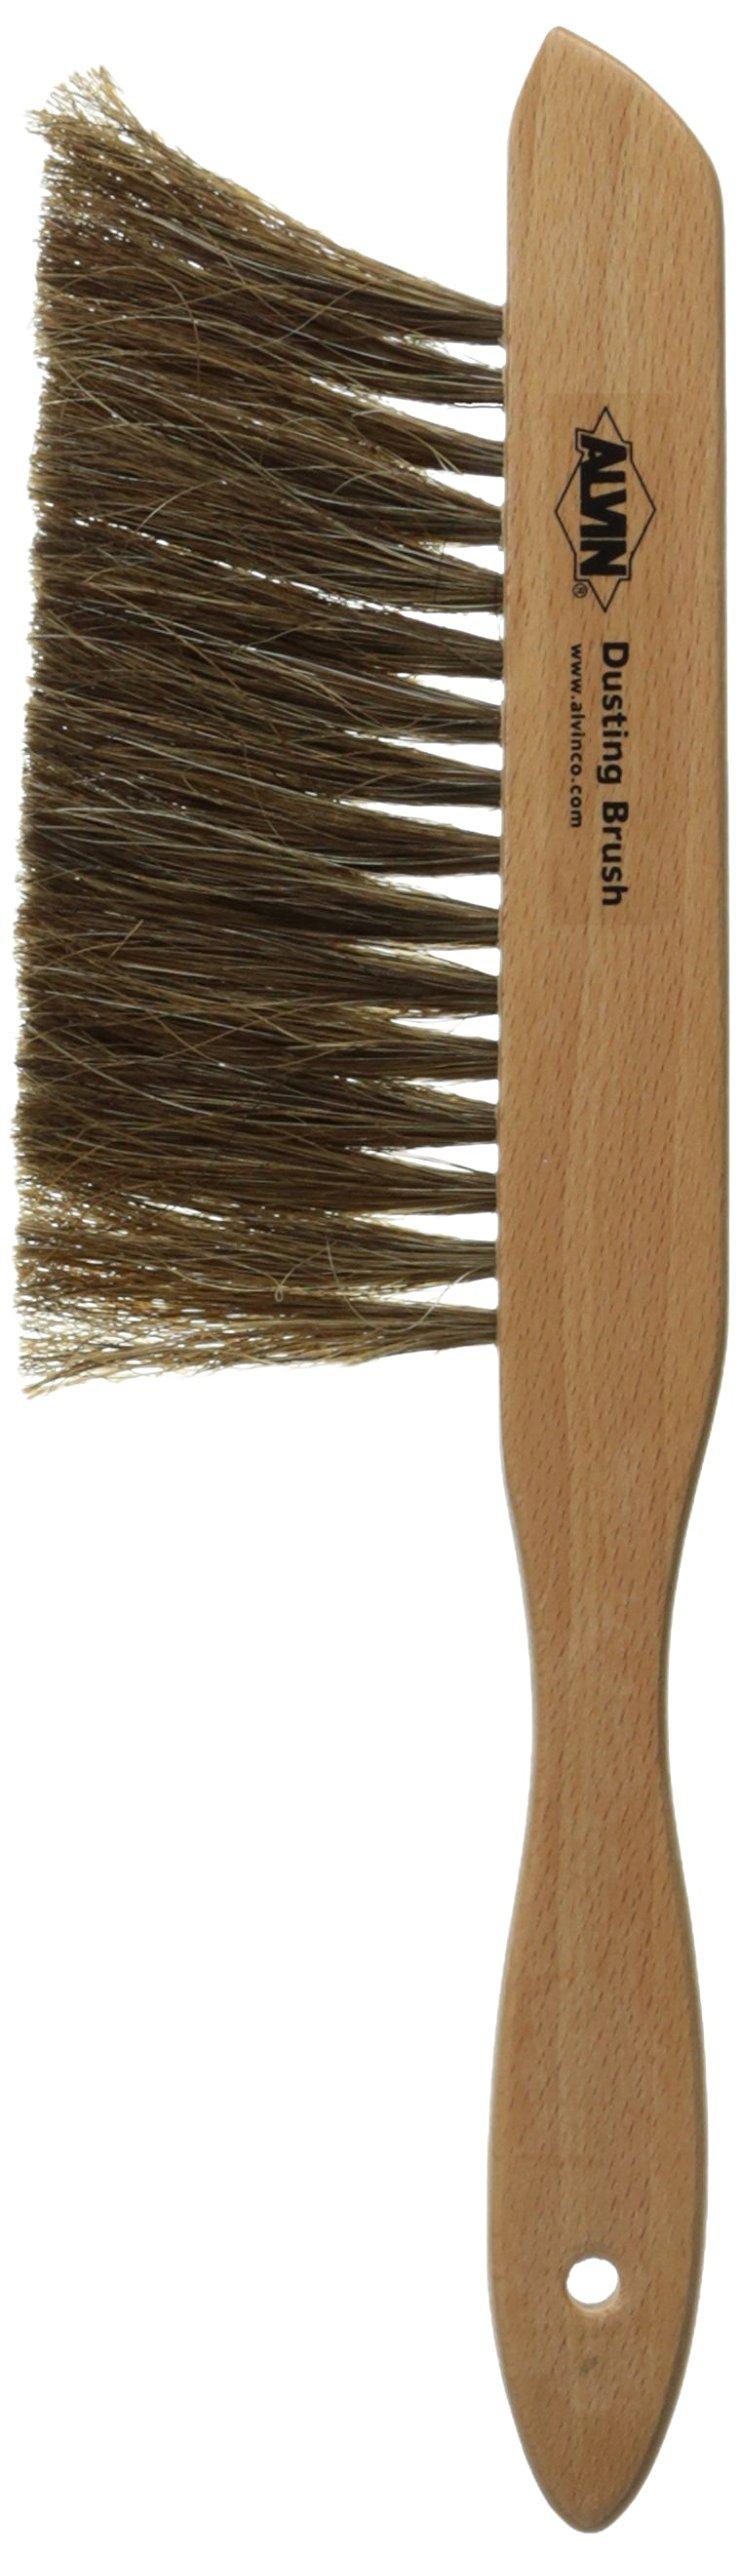 Alvin 2340 Mini Dusting Brush